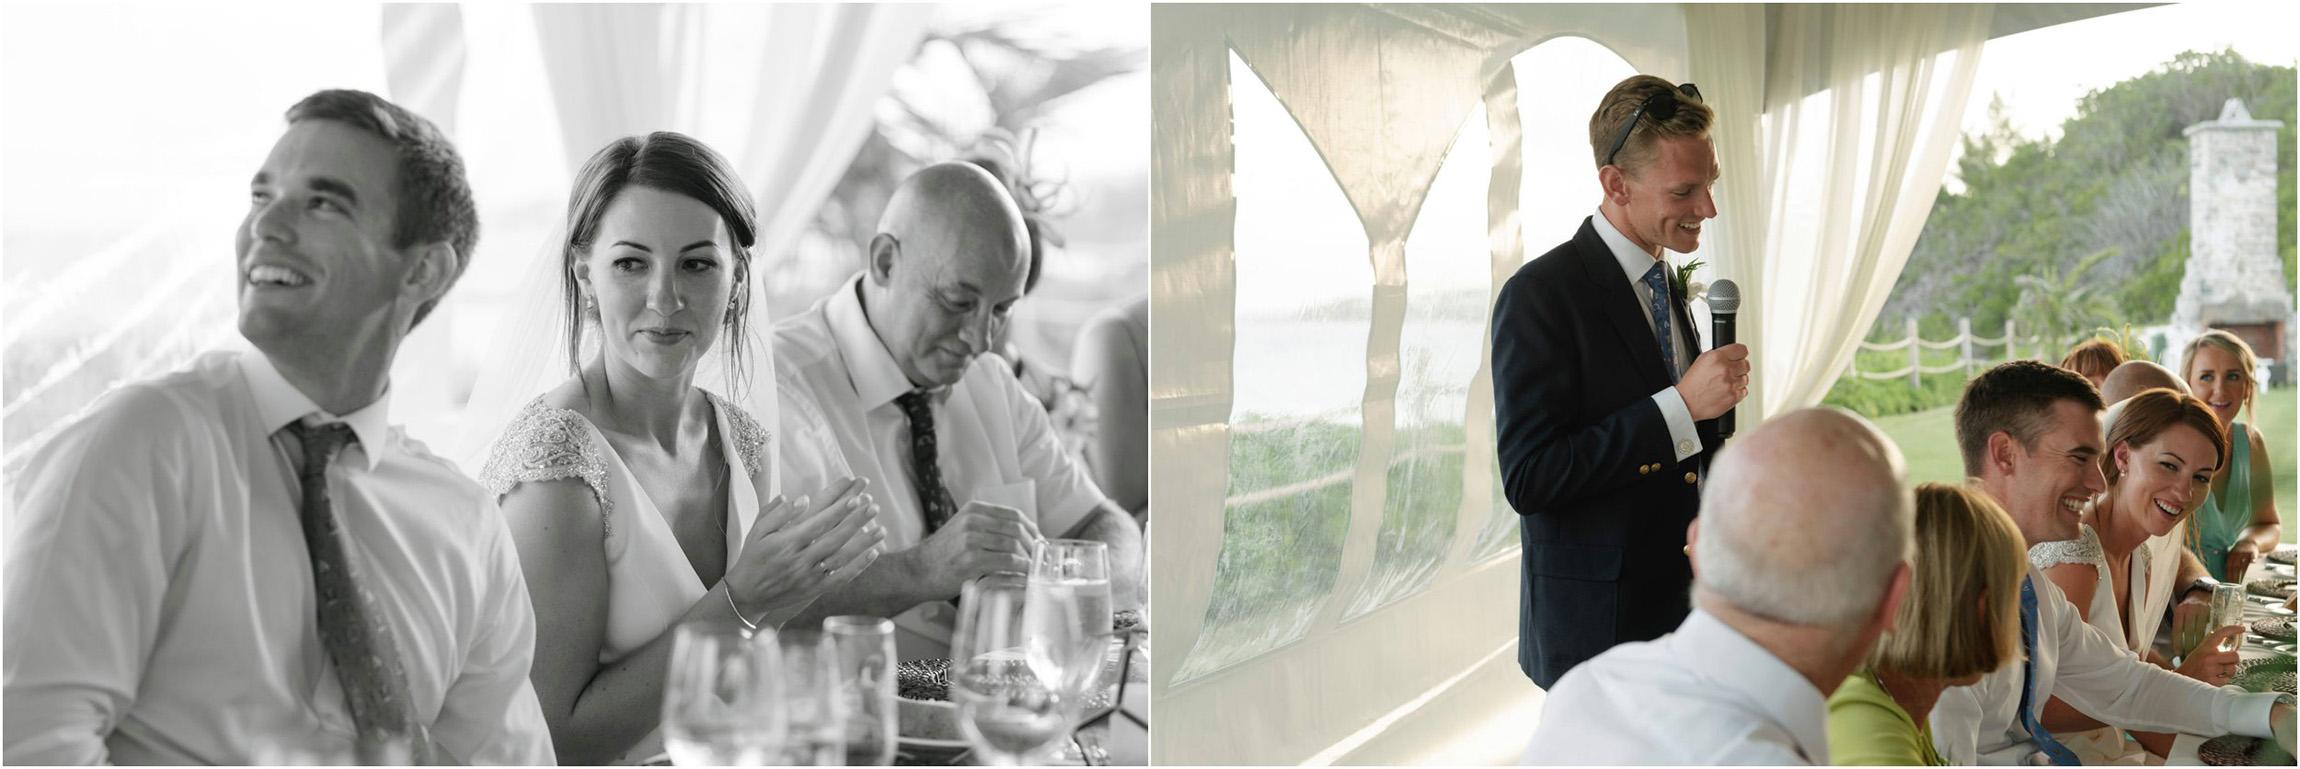 ©FianderFoto_Bermuda Wedding Photographer_Mid Ocean_Rachel_Angus_110.jpg